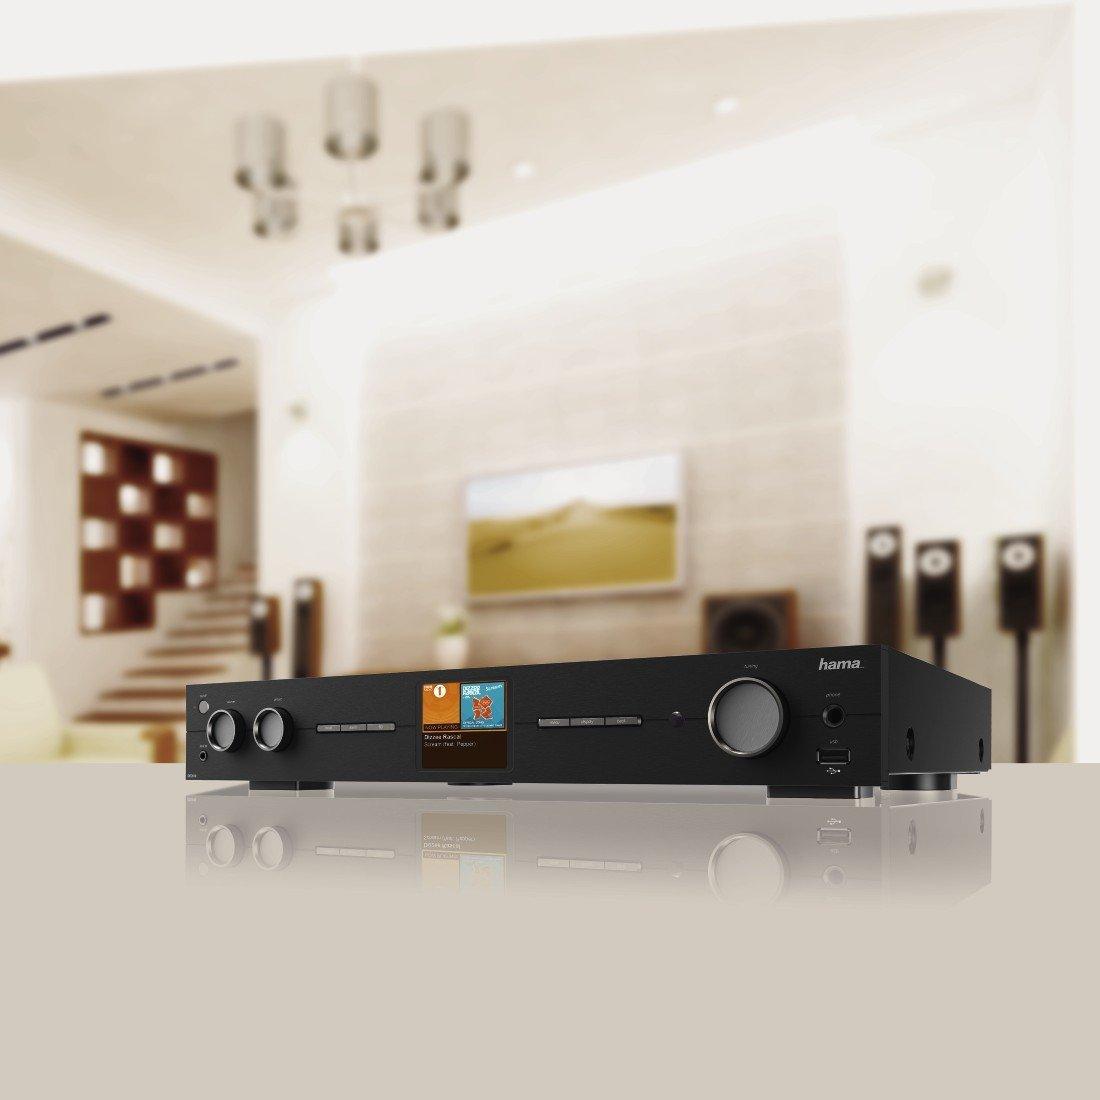 hama hifi tuner internetradio und digitalradio dit2010mbt wlan lan dab dab fm 2 8 zoll. Black Bedroom Furniture Sets. Home Design Ideas